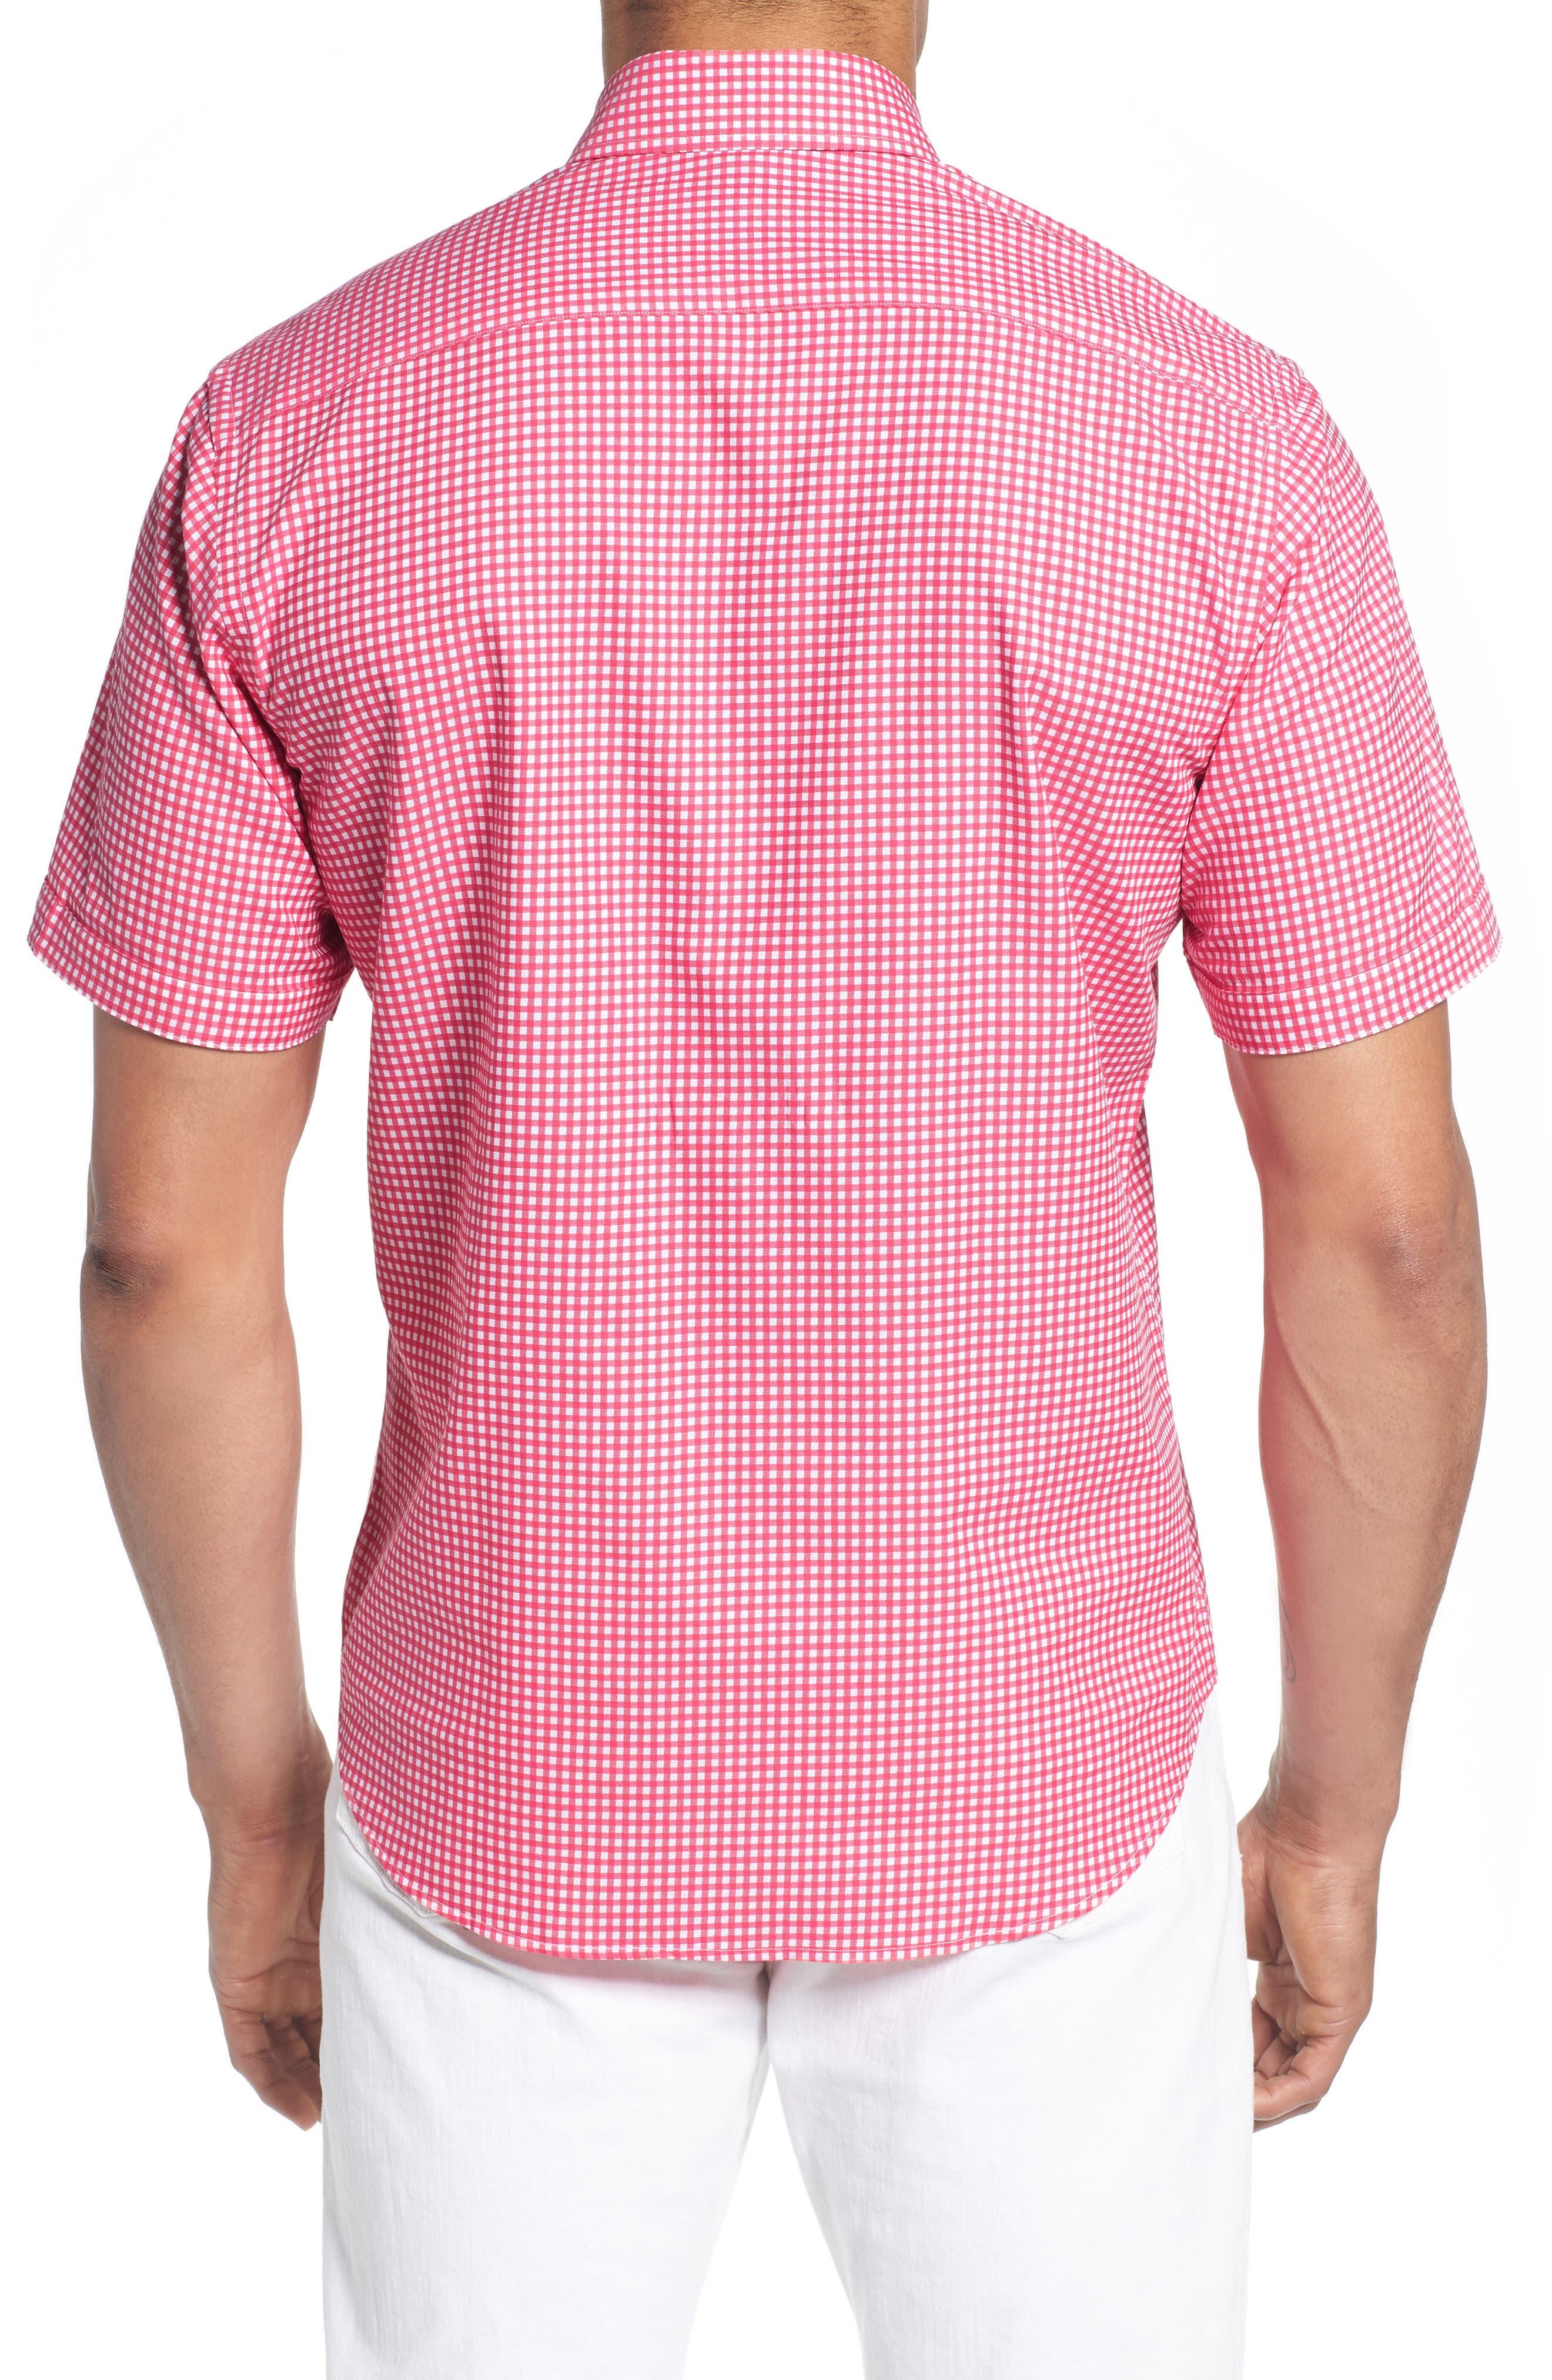 Aden Regular Fit Sport Shirt,                             Alternate thumbnail 3, color,                             Coral